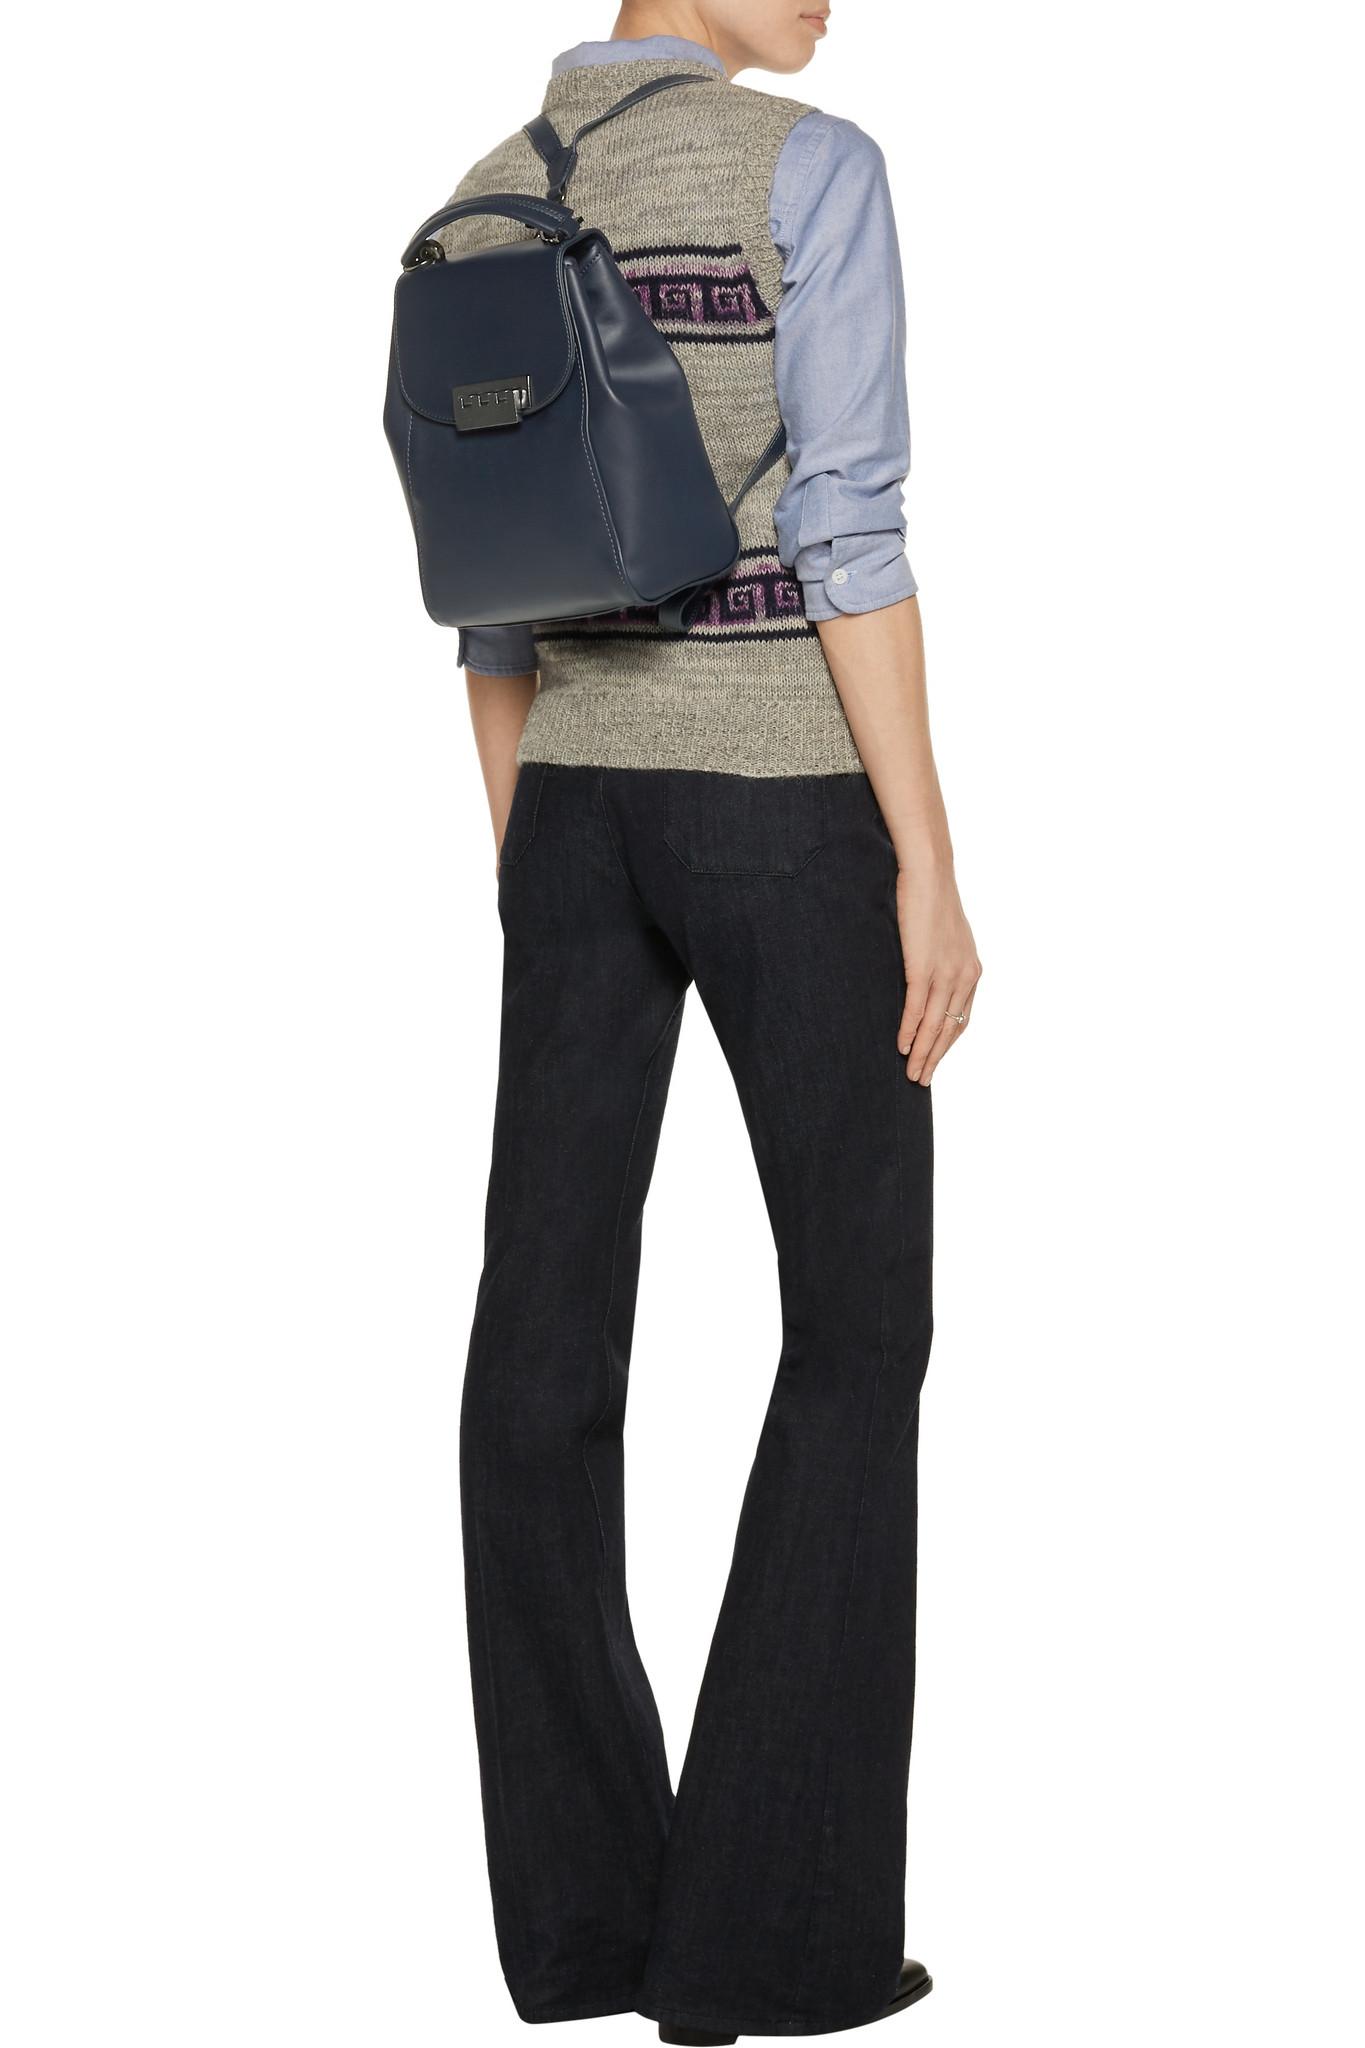 Zac zac posen Eartha Metallic Leather Backpack in Blue